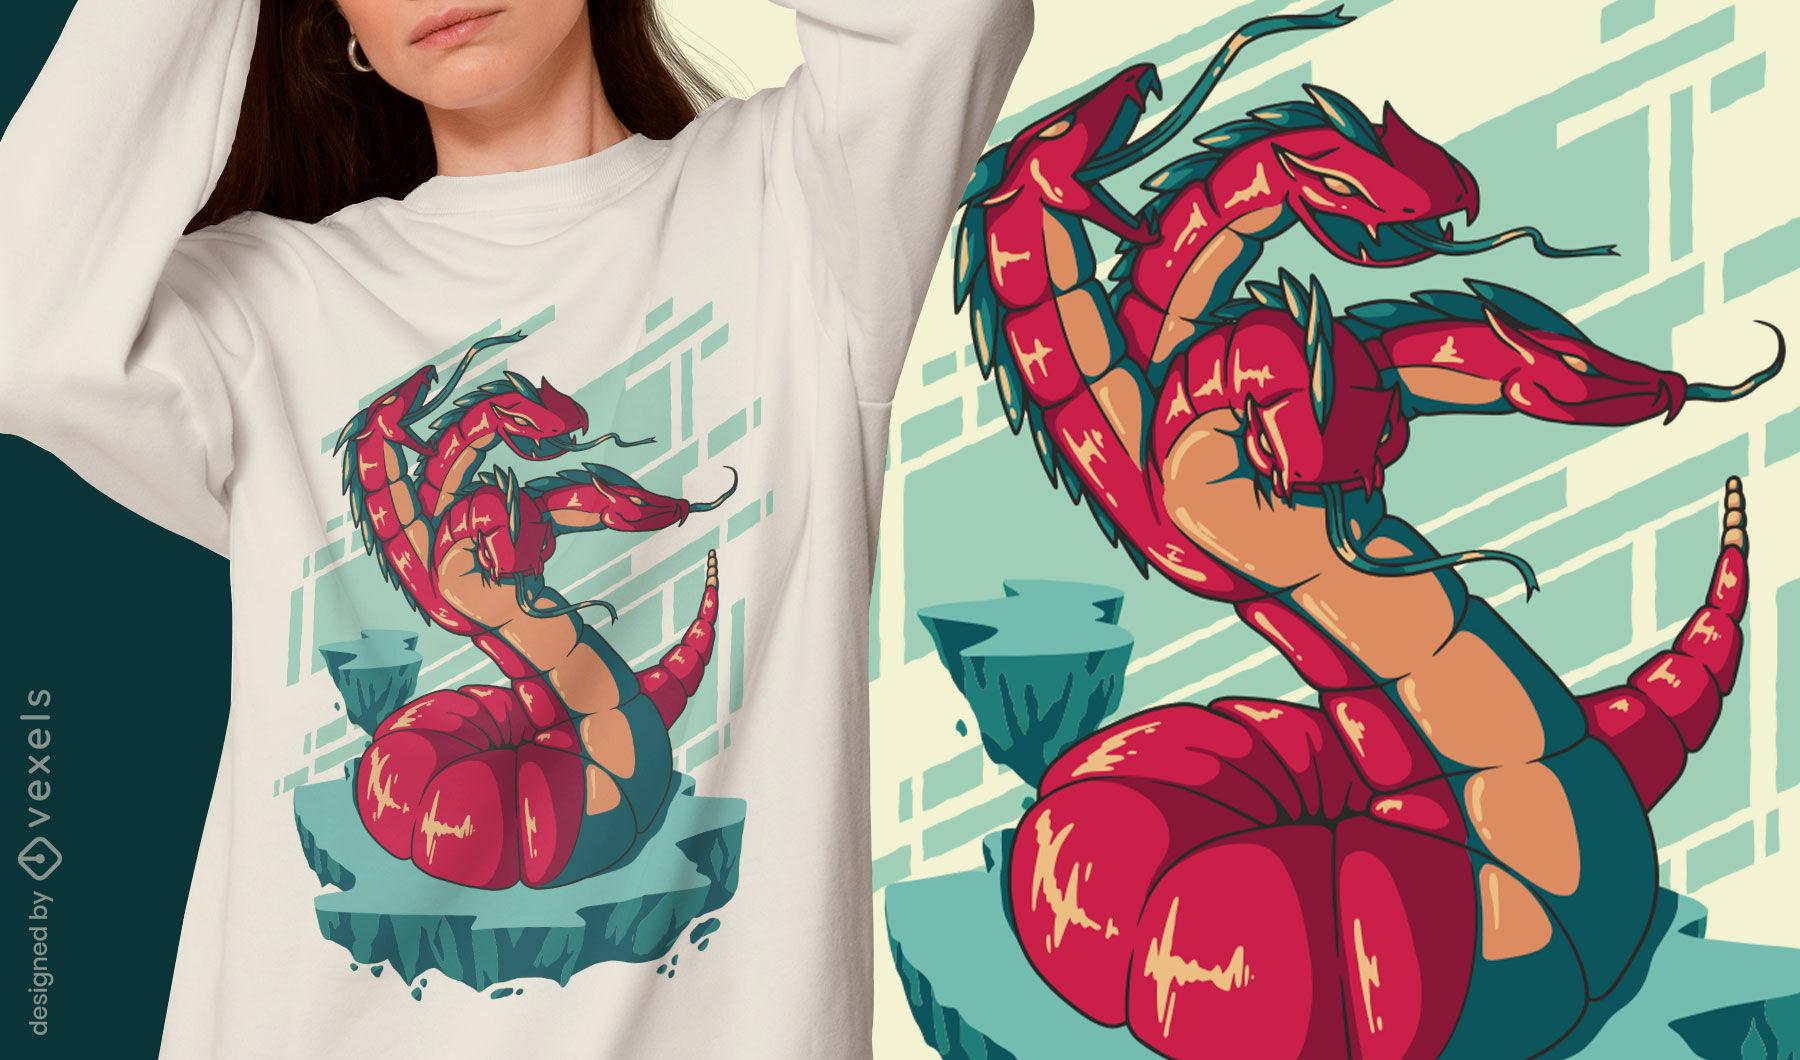 Hydra nightmare monster t-shirt design